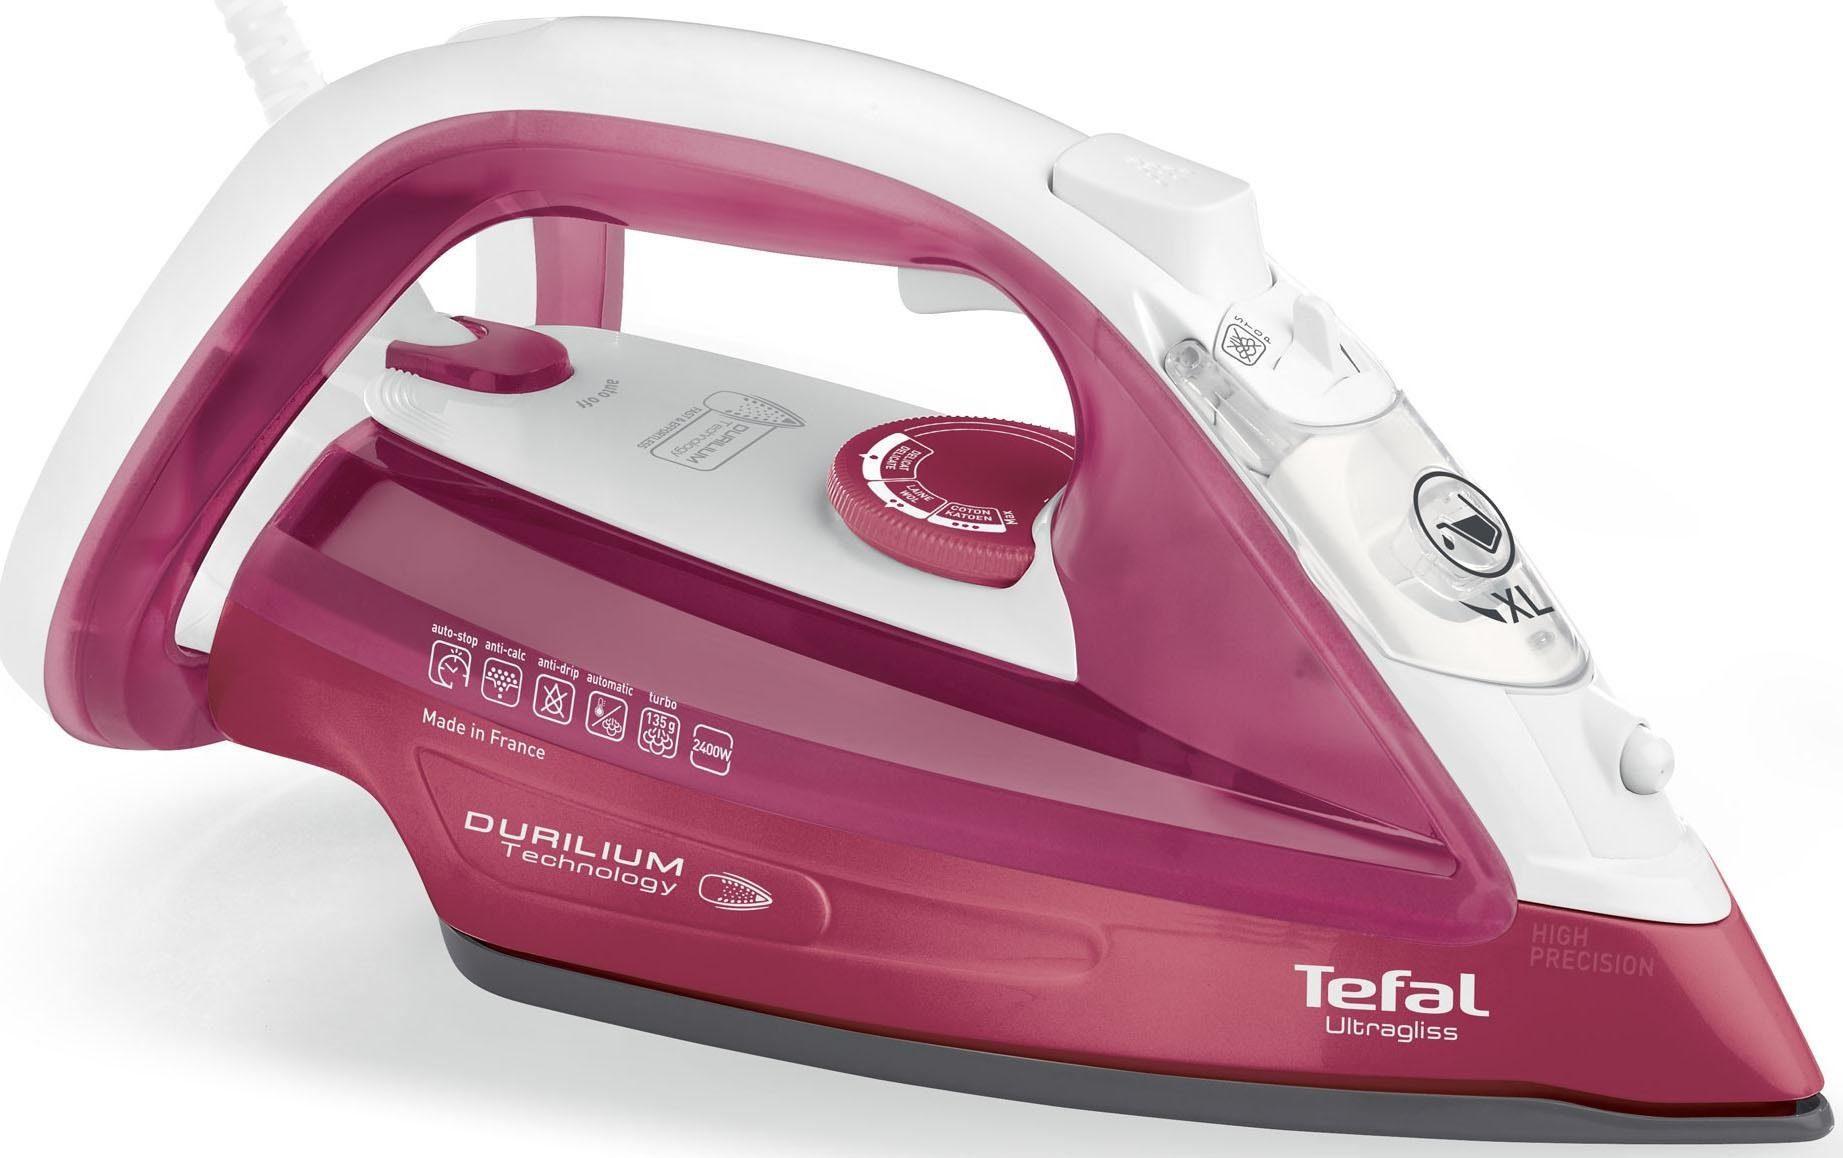 Tefal Dampfbügeleisen FV4920 Ultragliss, Antikalk-System, extra Dampfstoß 140 g/min, rot/weiß